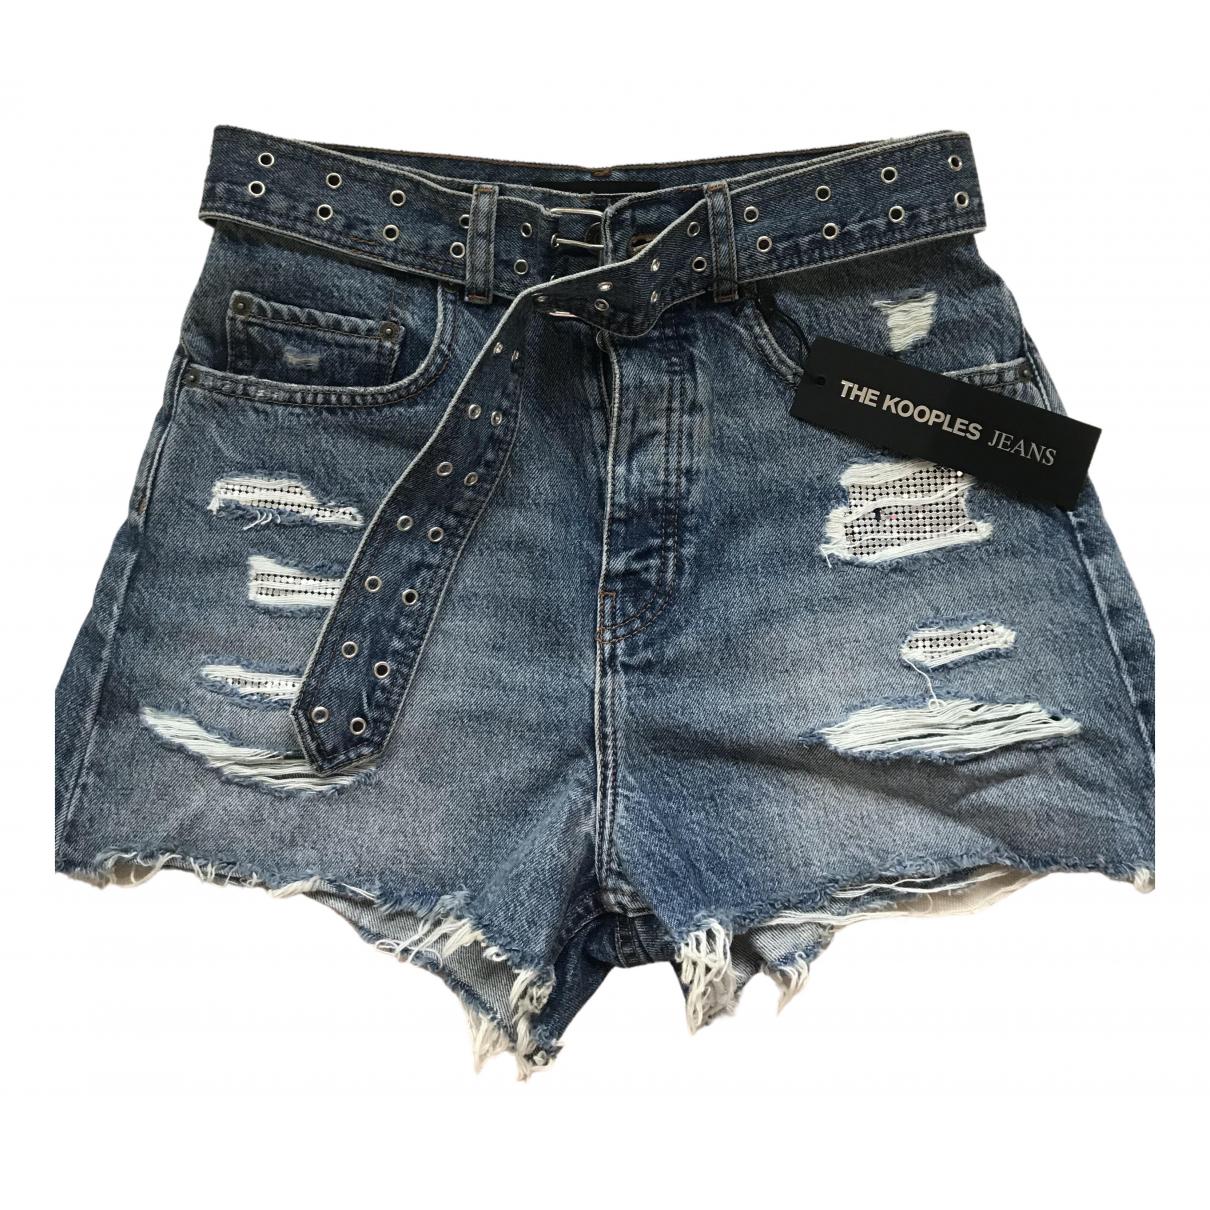 The Kooples Fall Winter 2019 Shorts in  Blau Denim - Jeans